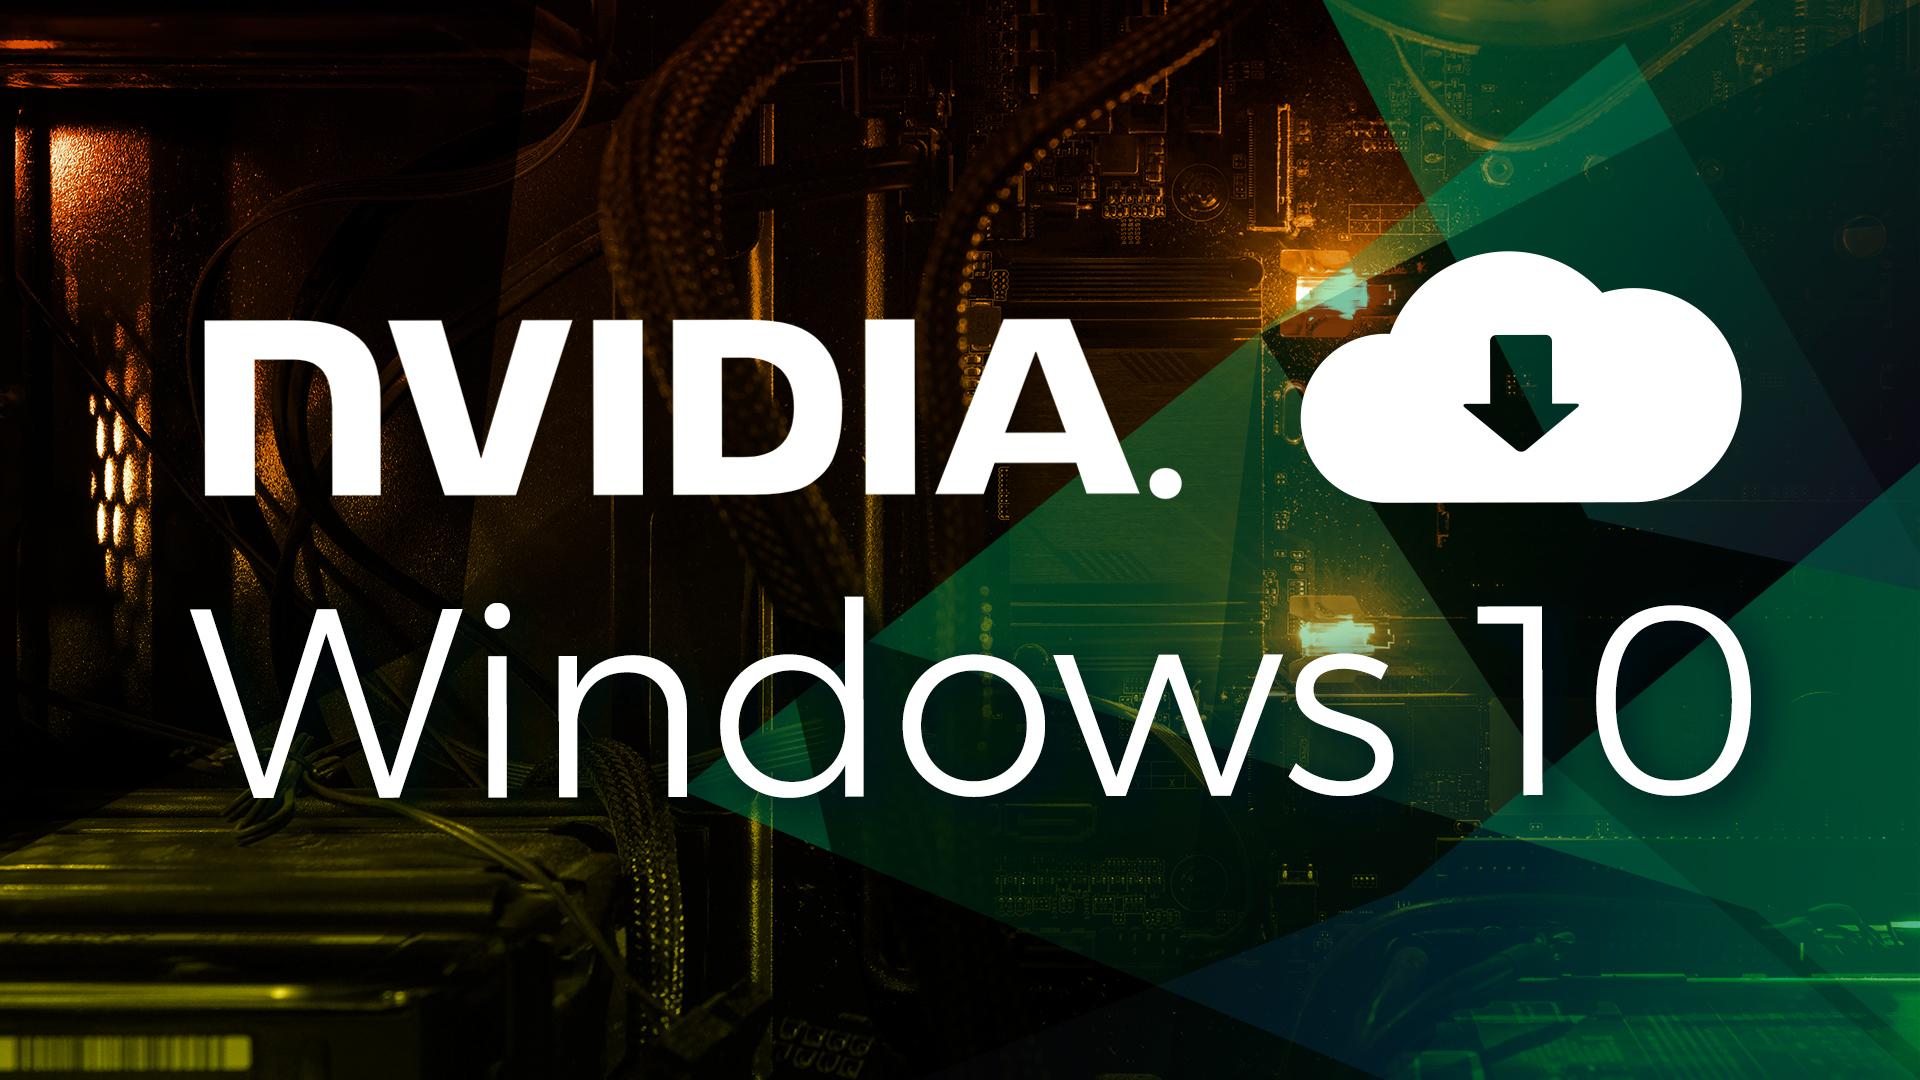 Windows 10, Gaming, Nvidia, Grafikkarte, Treiber, Nvidia Geforce, Driver, Nvidia Treiber, nvidia download, Grafik-Treiber